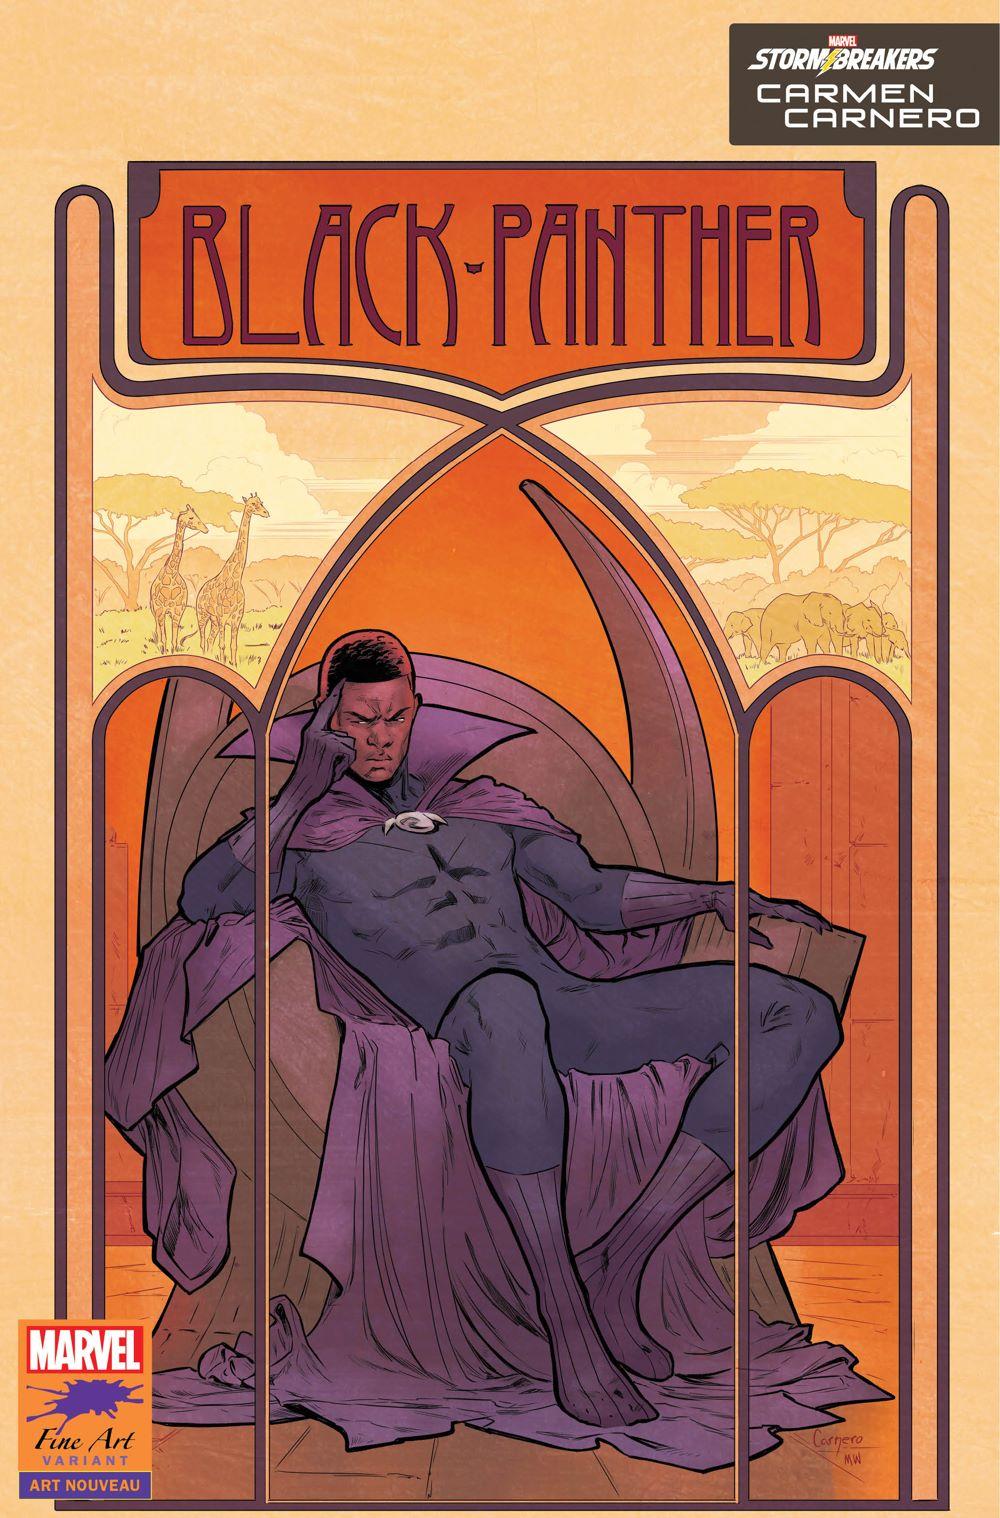 BLAP25_FINEART_CARNERO ComicList: Marvel Comics New Releases for 05/26/2021